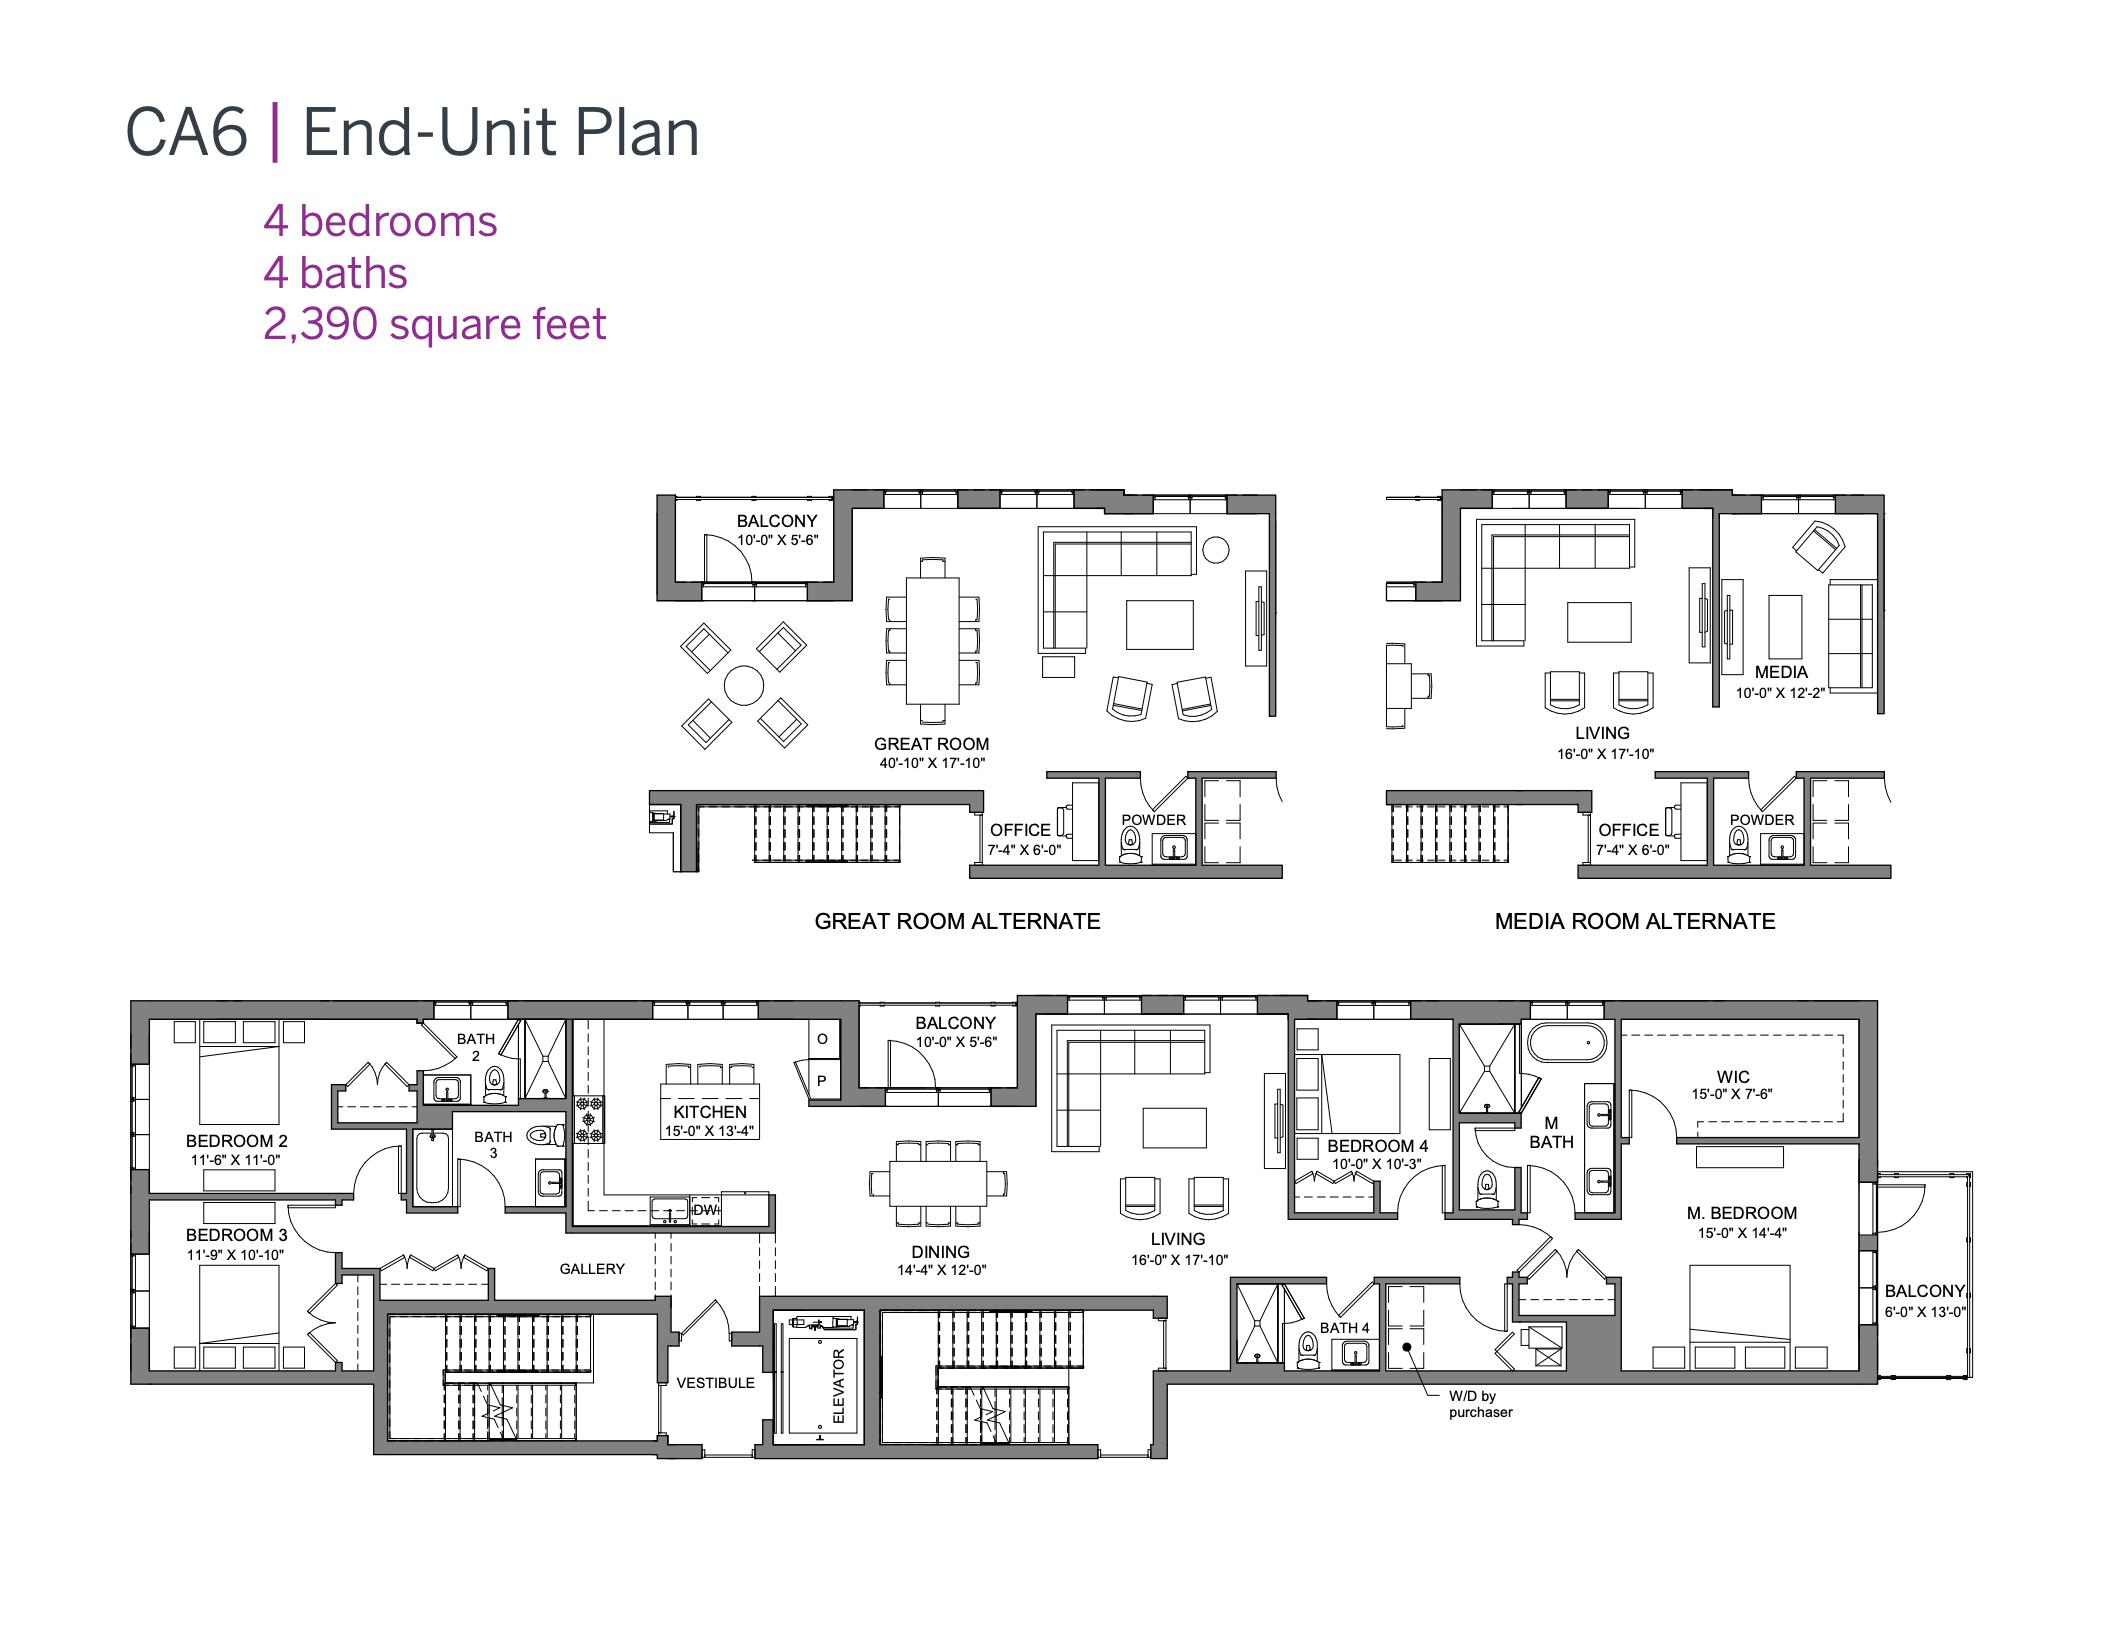 CA6 Condominiums end-unit plan (four bedroom)